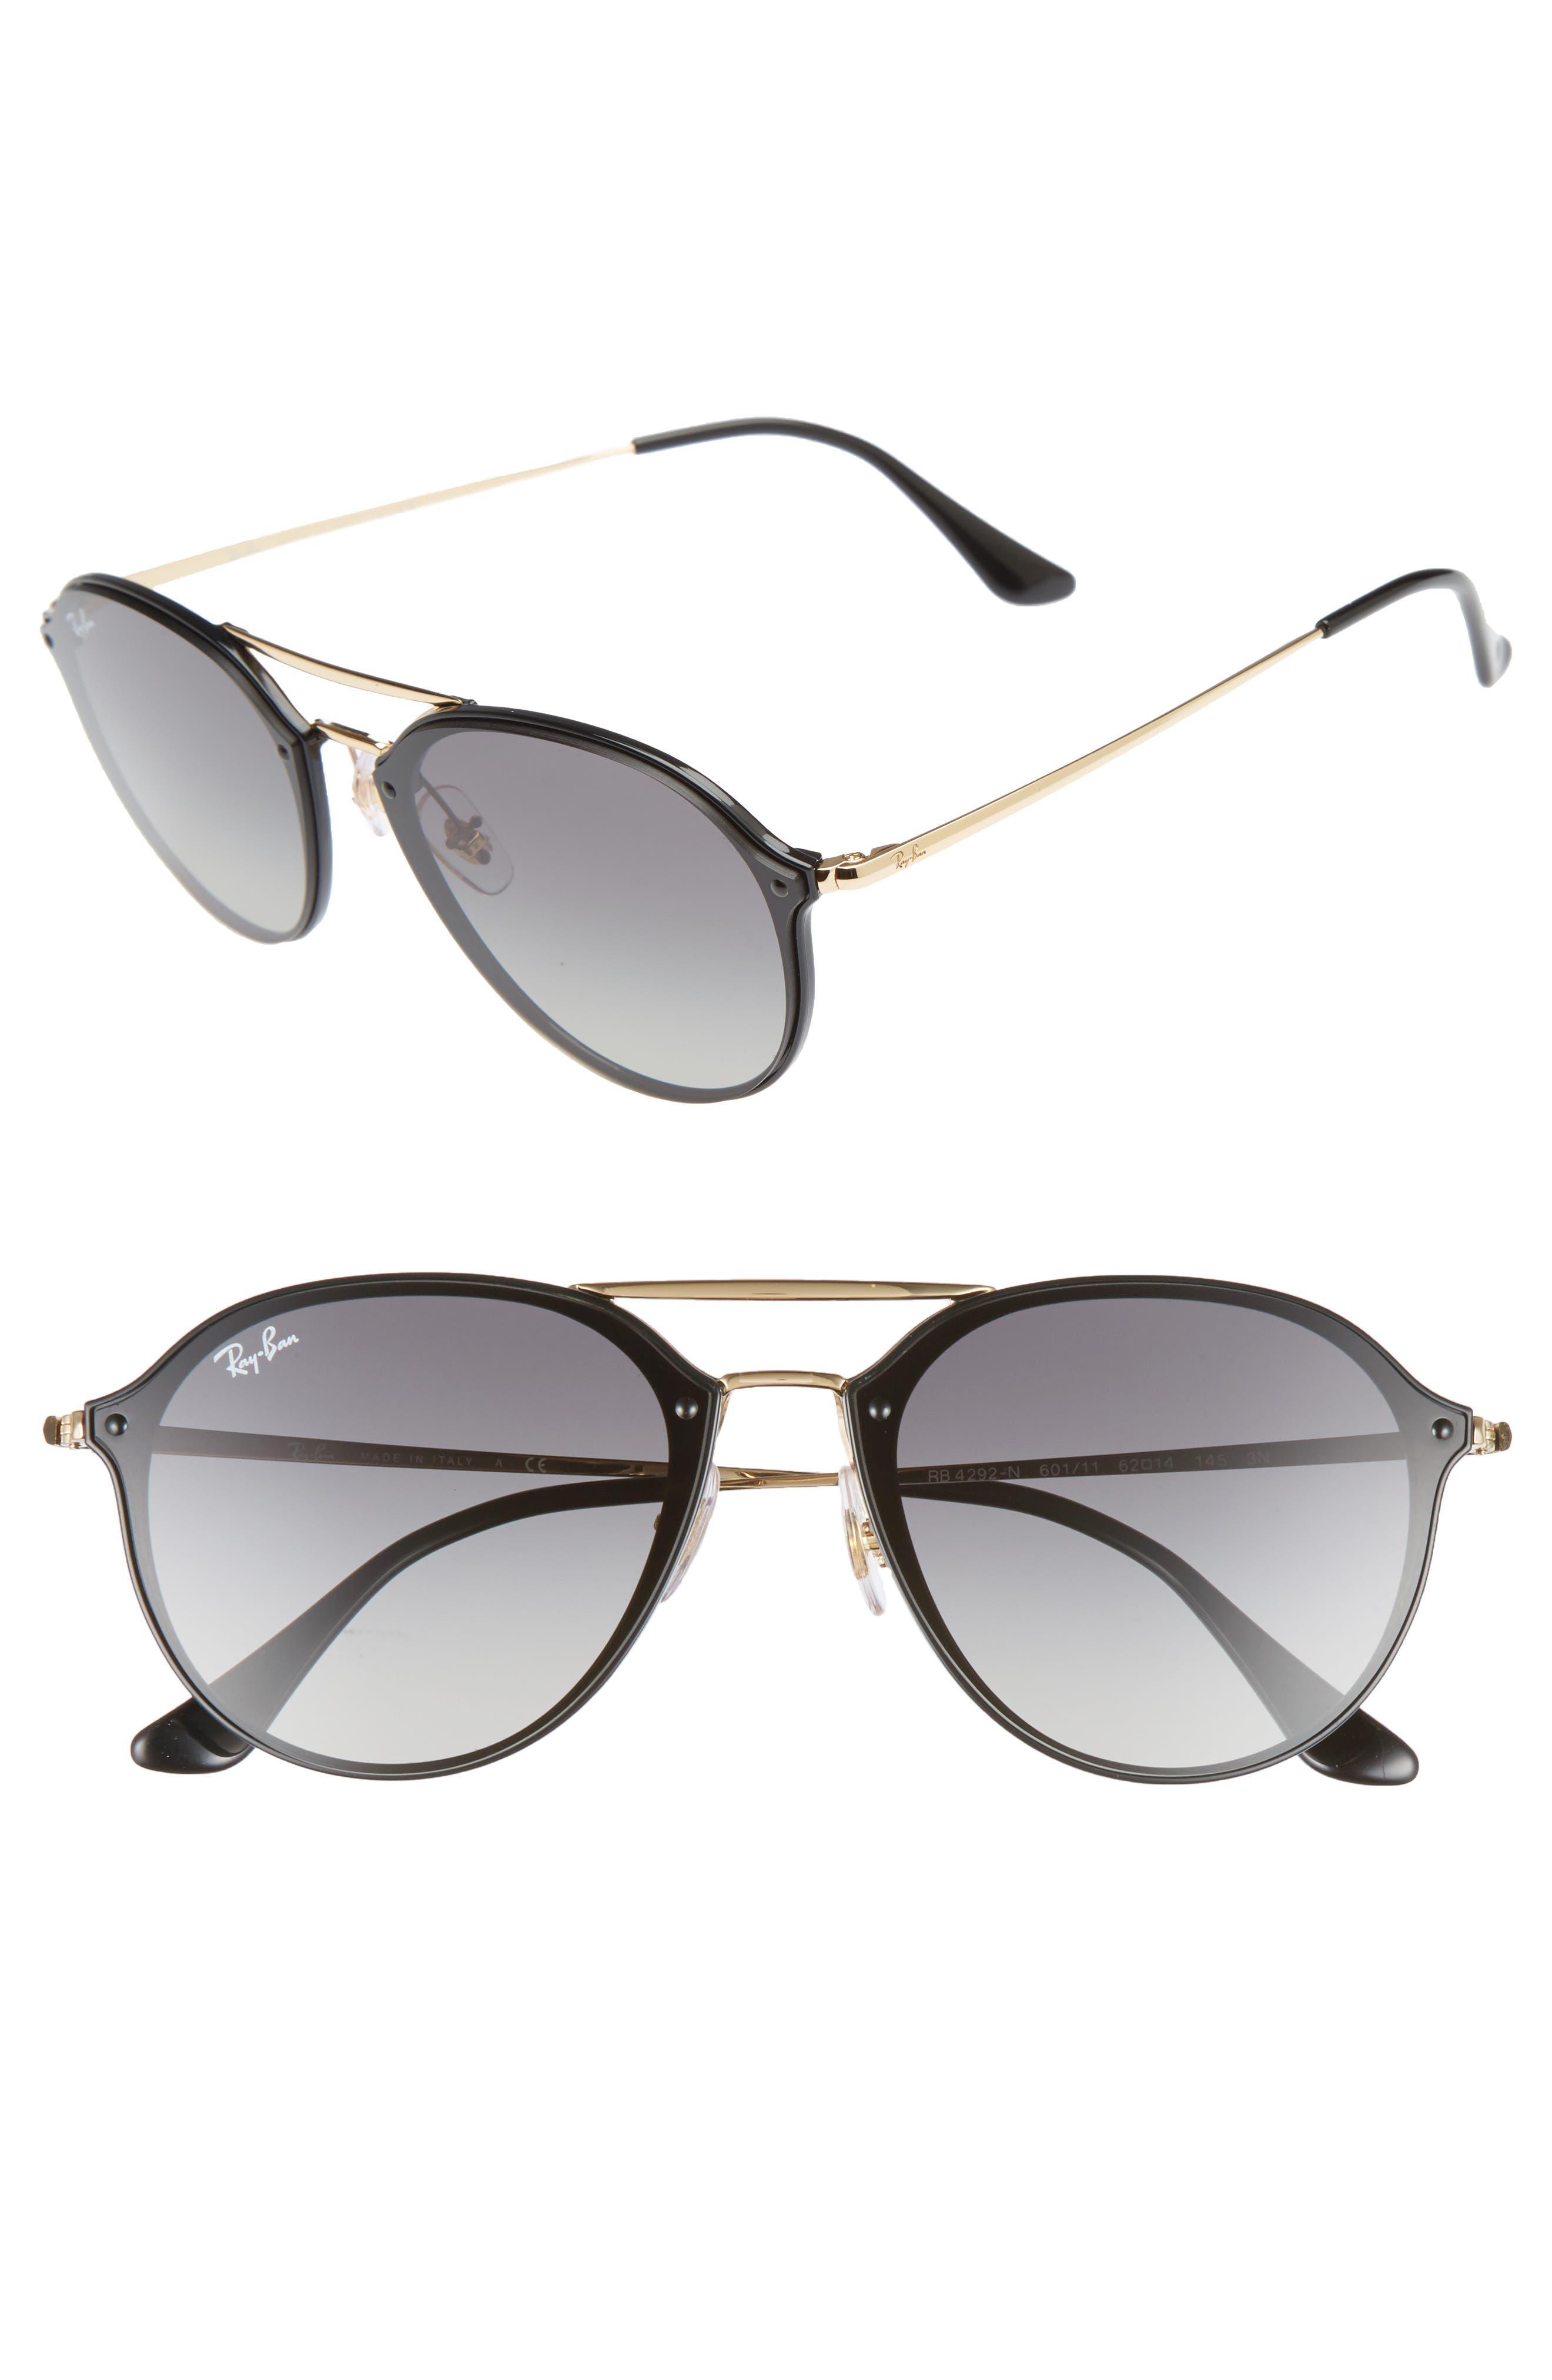 62mm Gradient Lens Aviator Sunglasses,                             Alternate thumbnail 2, color,                             BLACK